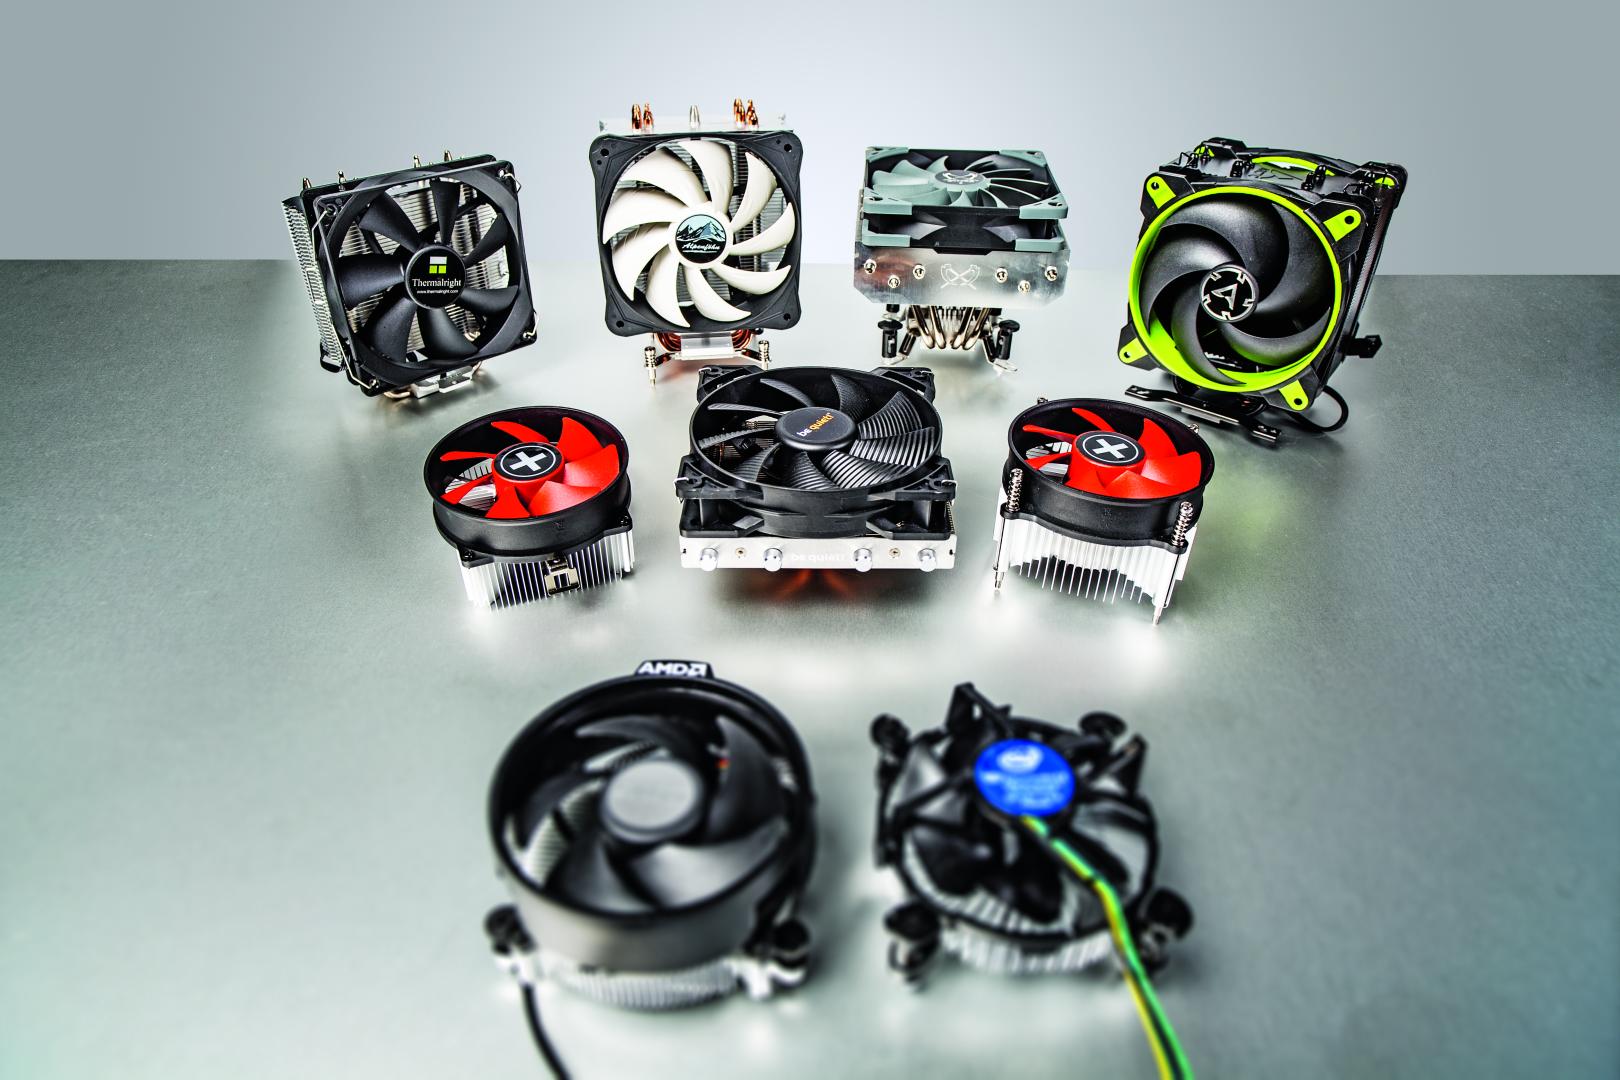 processorkoeler cpu-koeler test review AMD Intel voordelig goedkoop temperatuur geluid